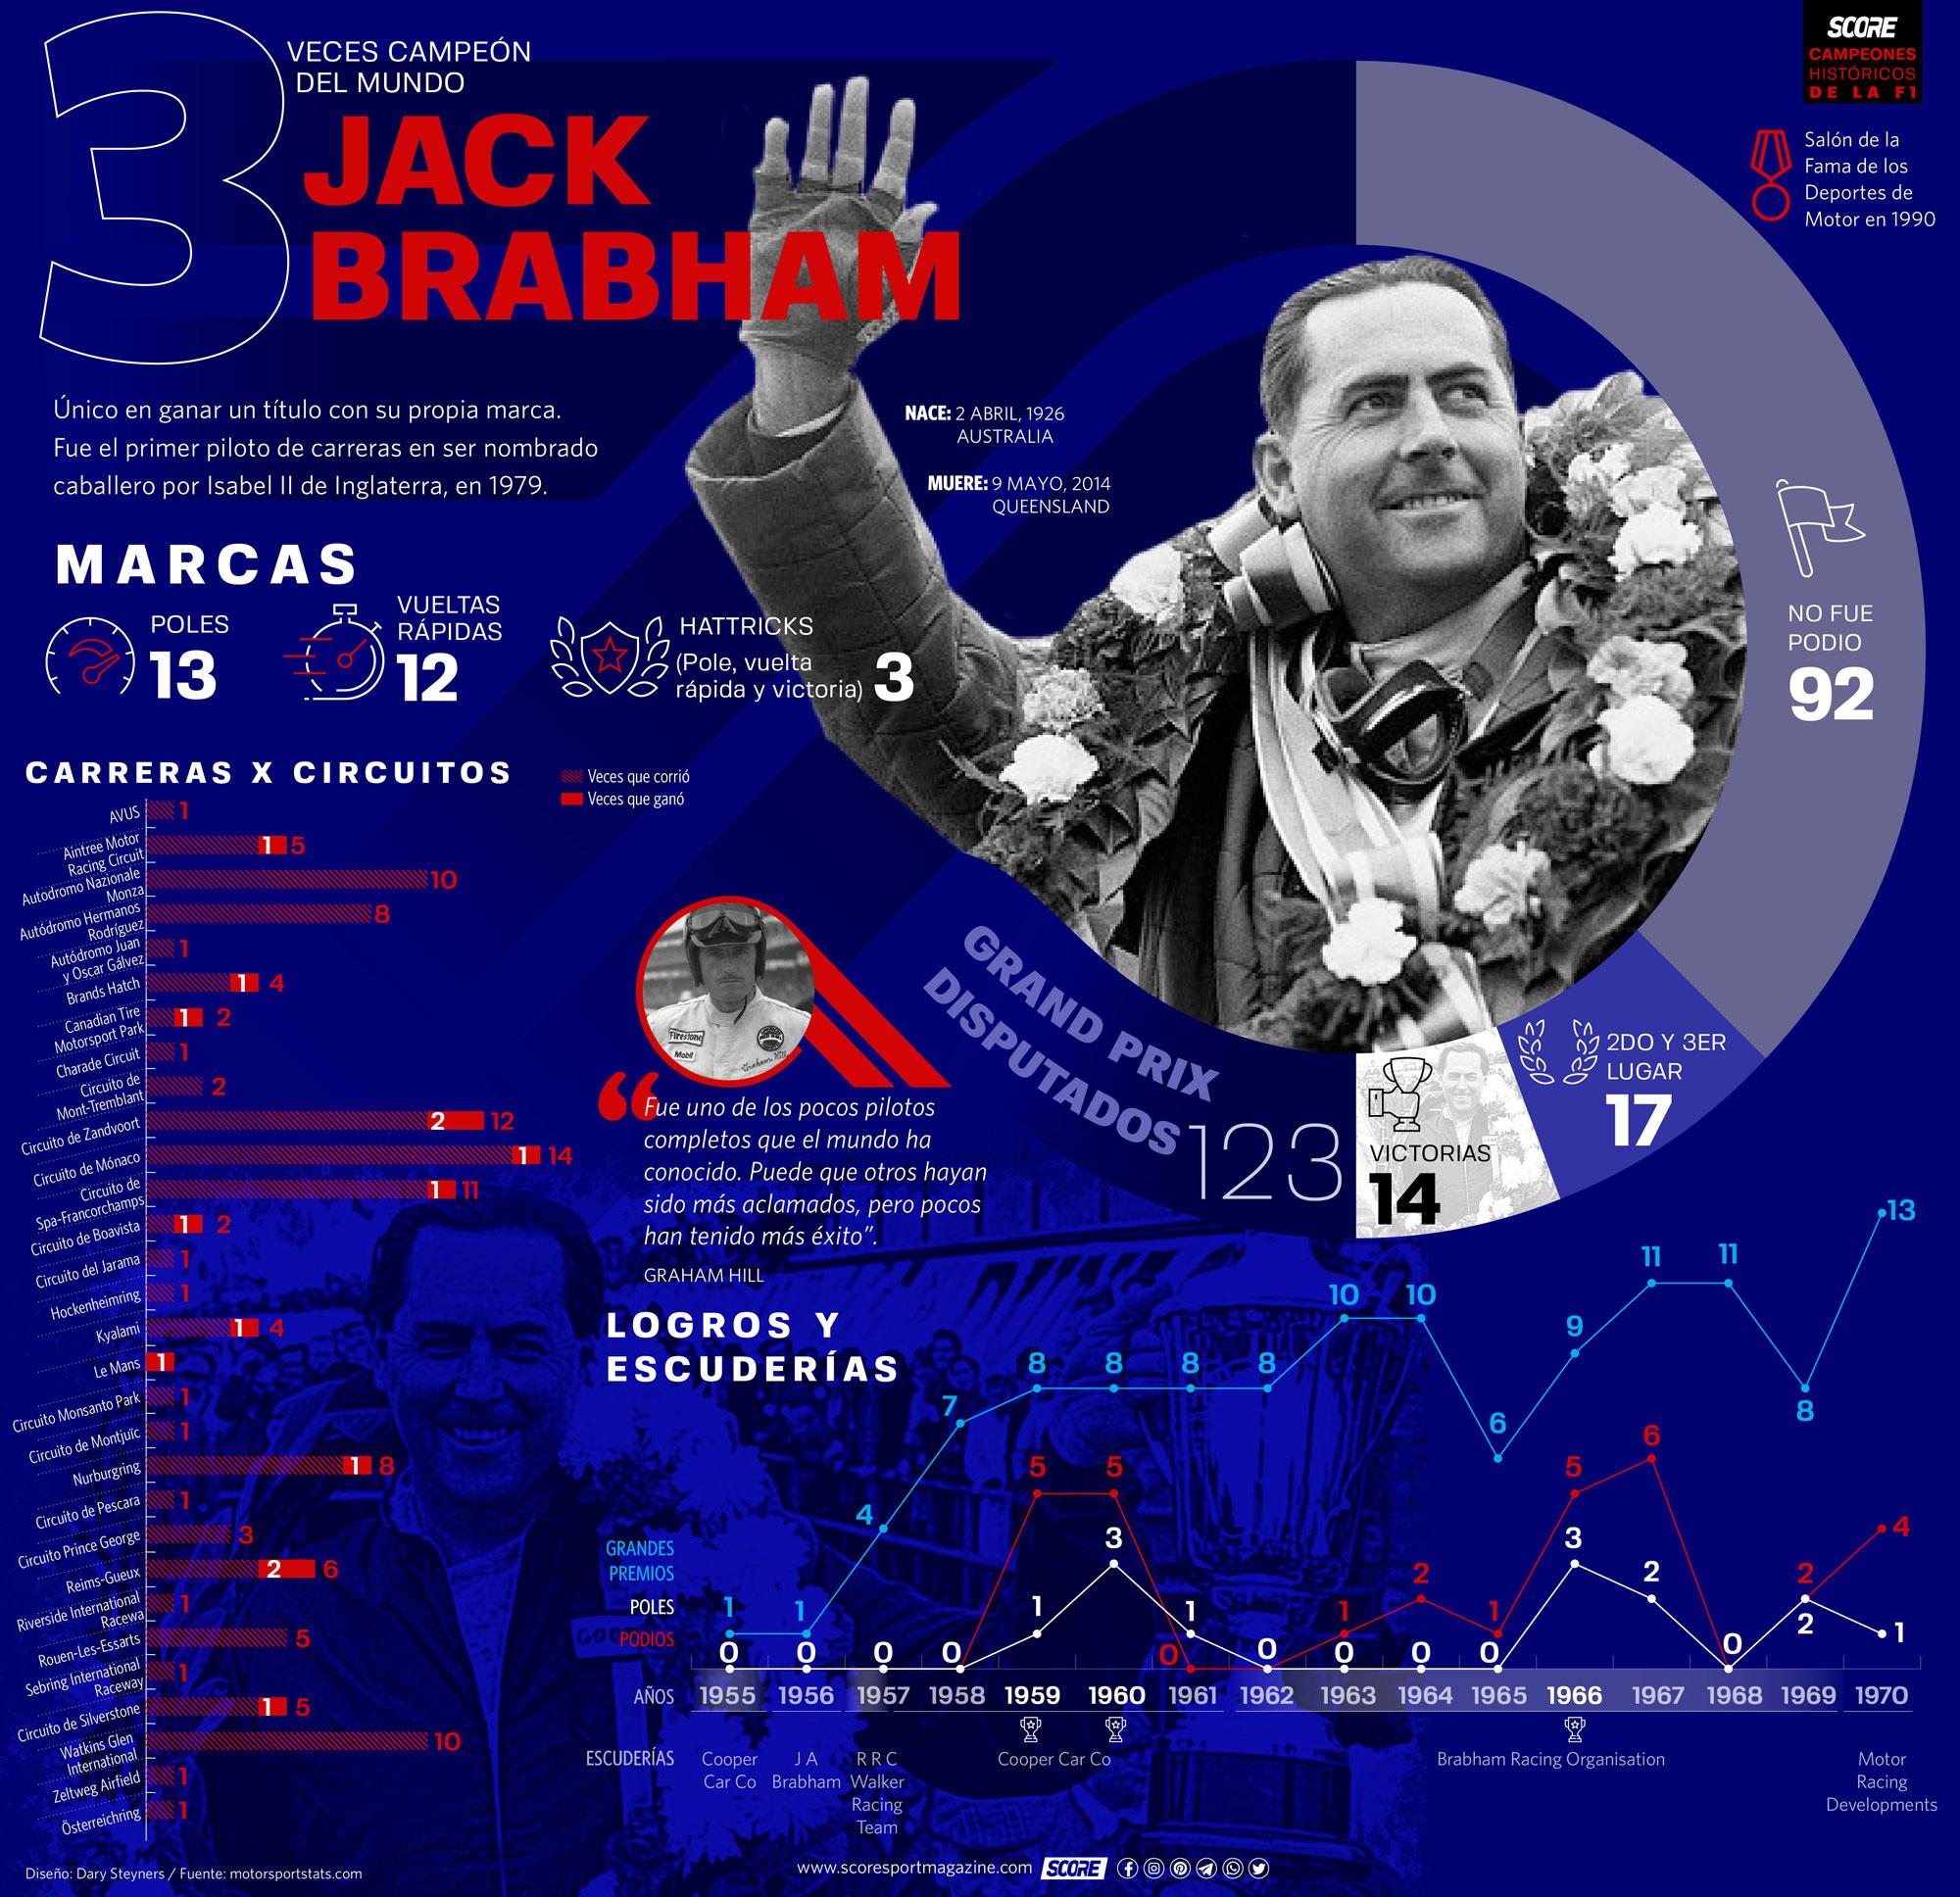 Jack Brabham-Serie Campeones Históricos de la F1